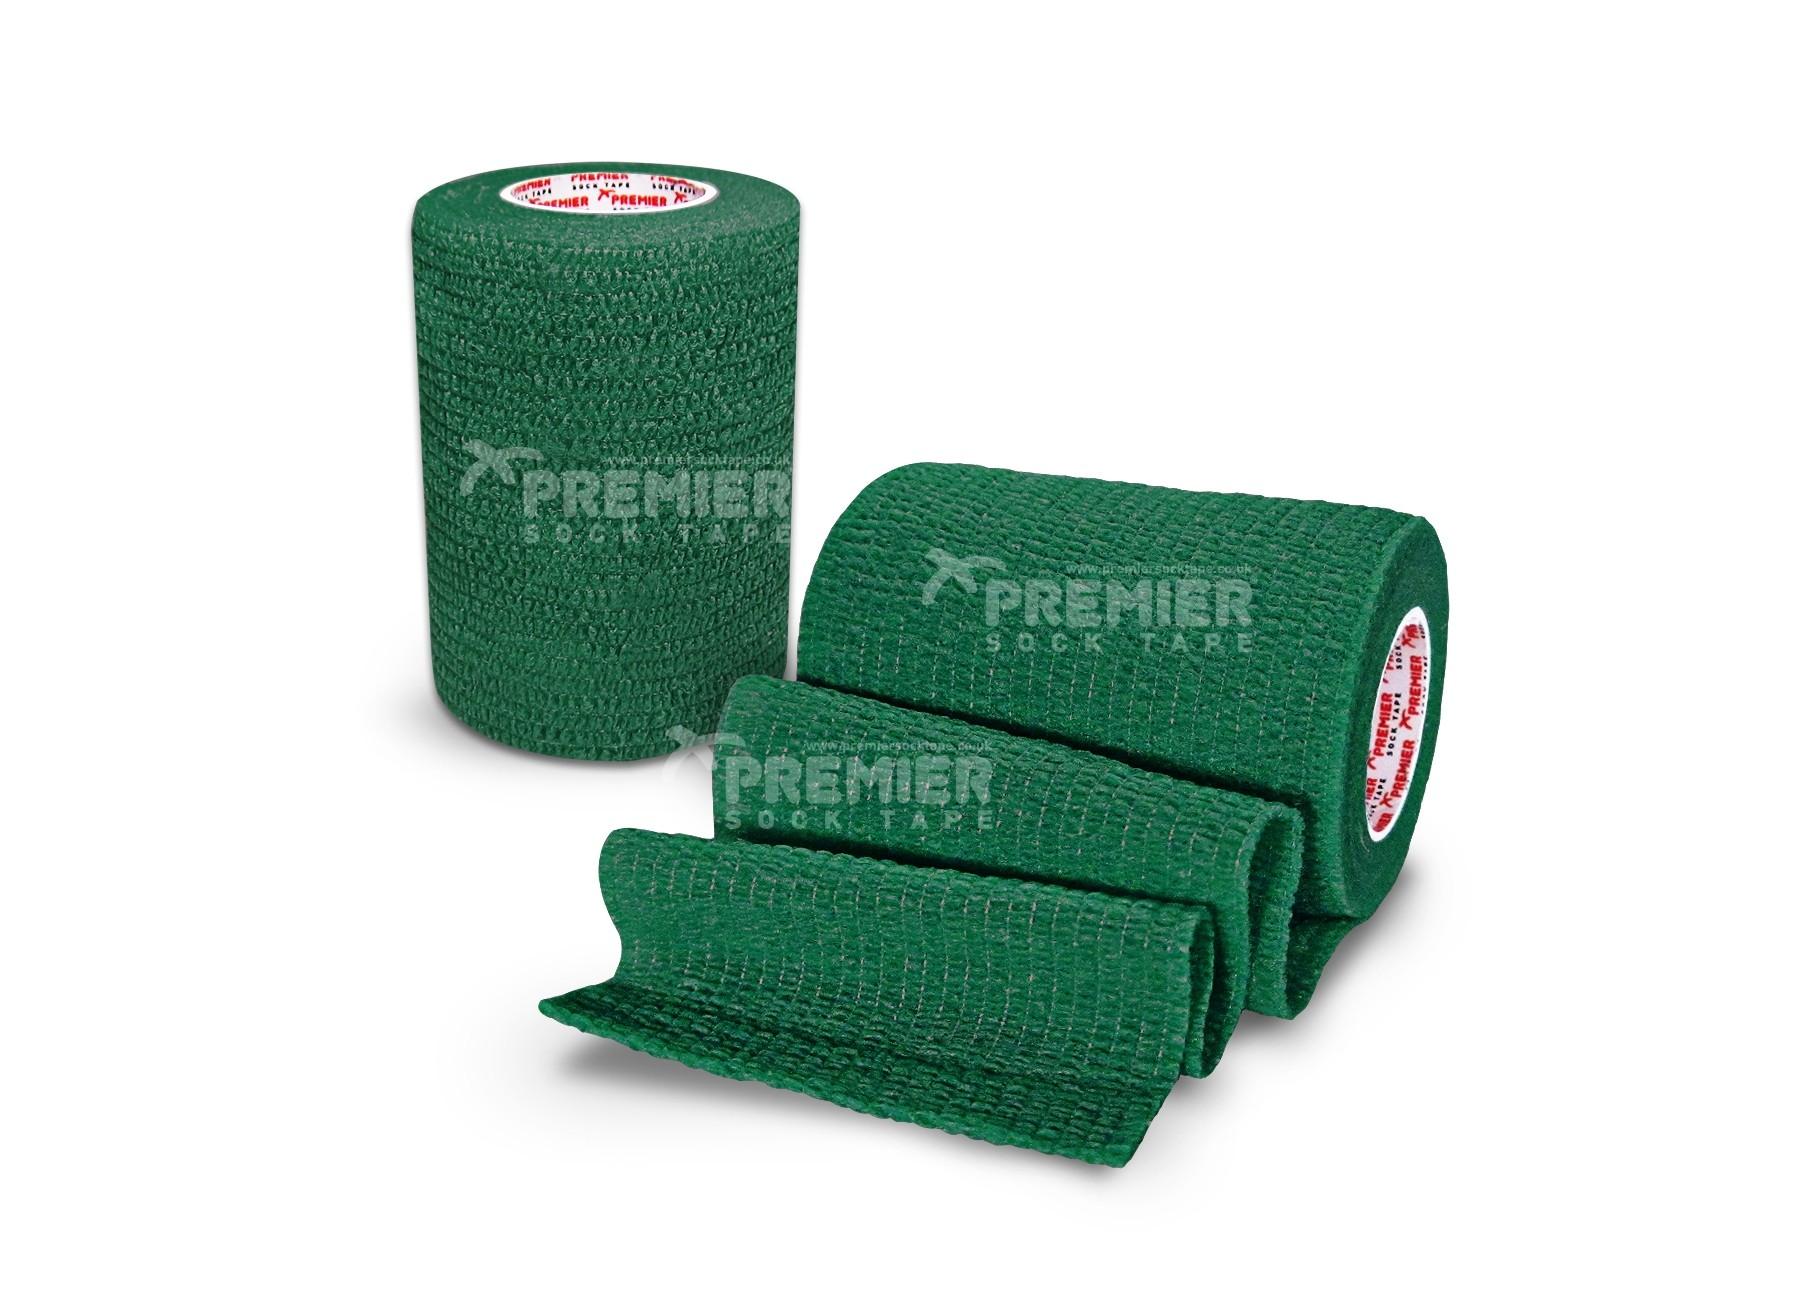 Premier Sock Tape Pro-Wrap 7.5cm - Green